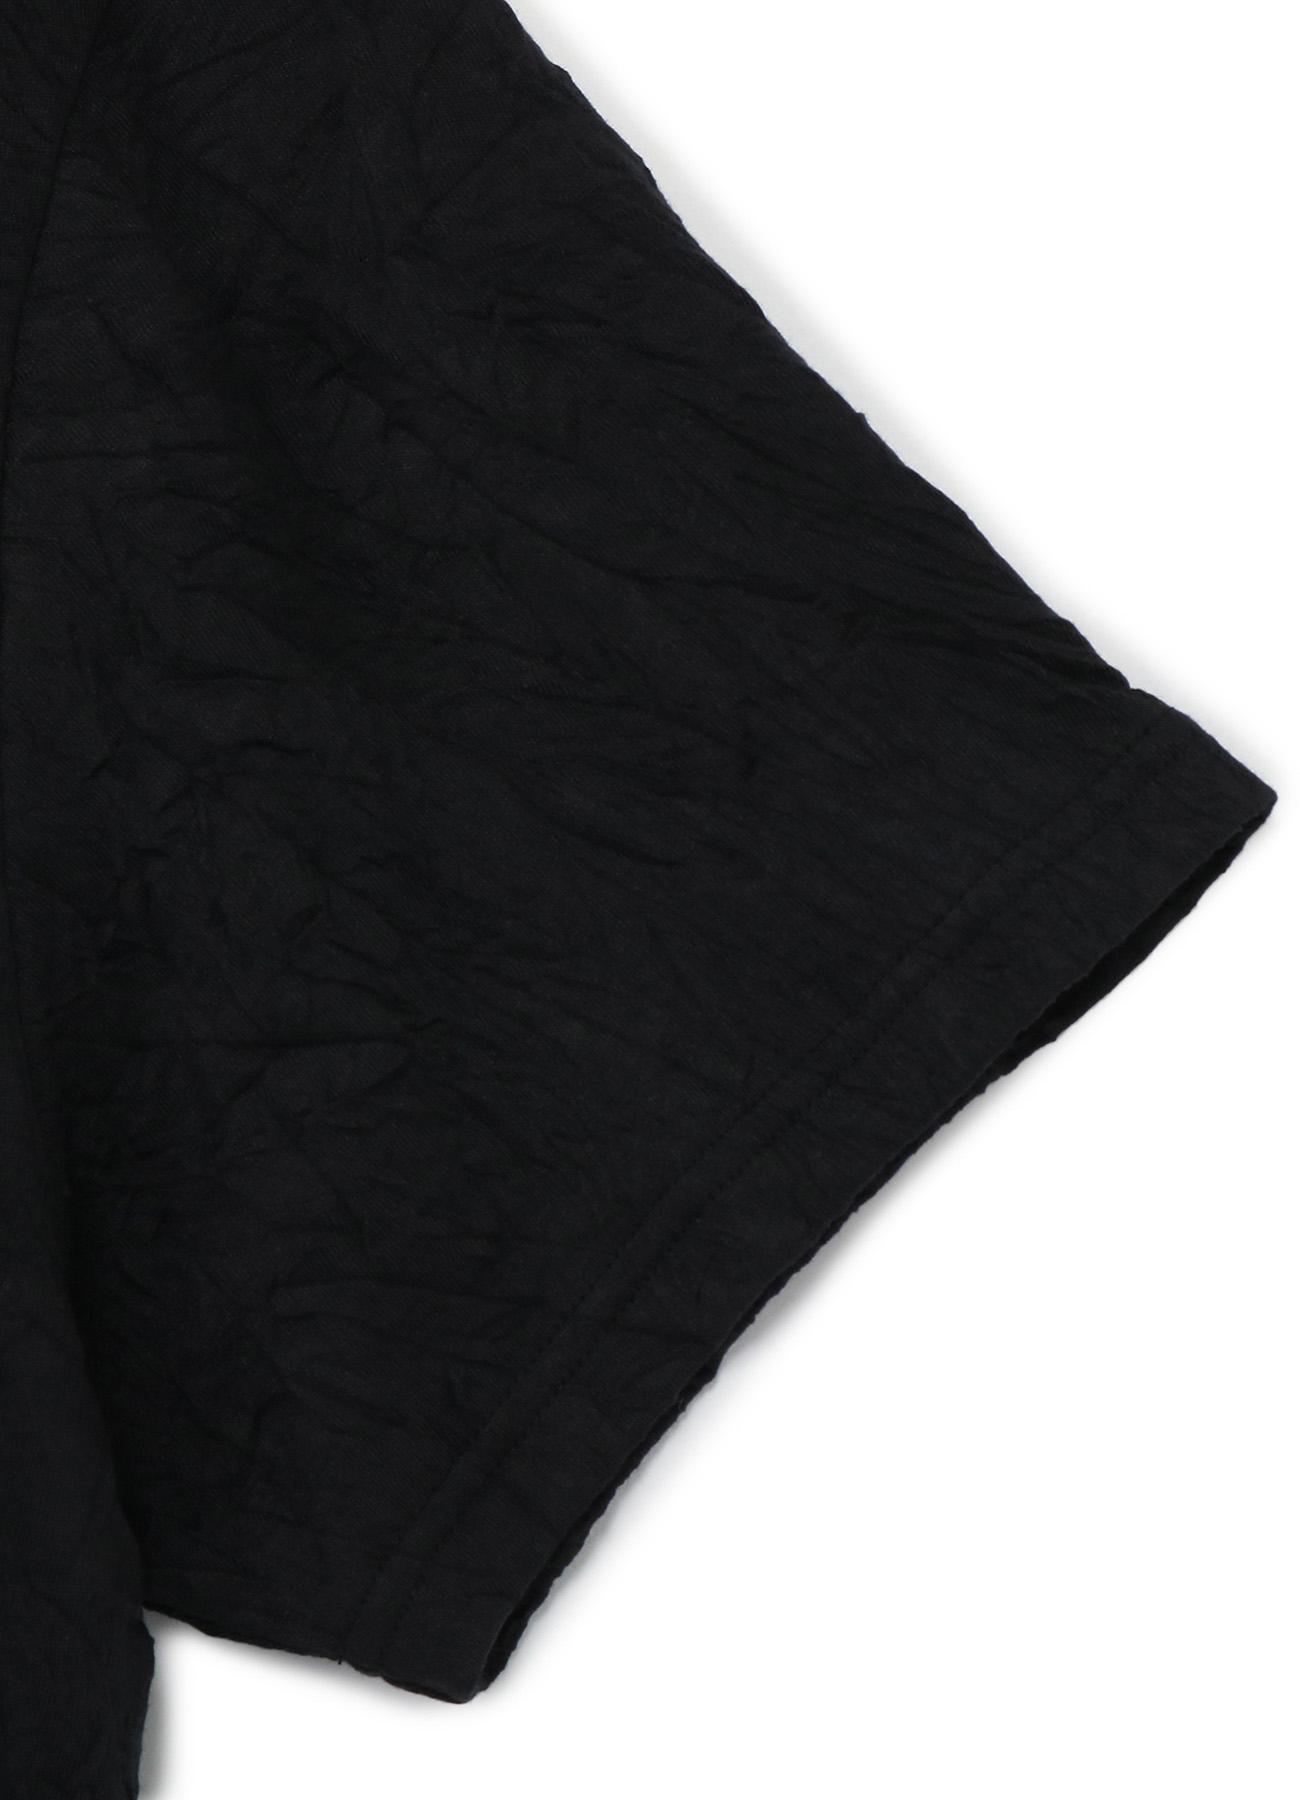 C/Pe Washer Jersey Collar Deformed Short Sleeves Cut Sew